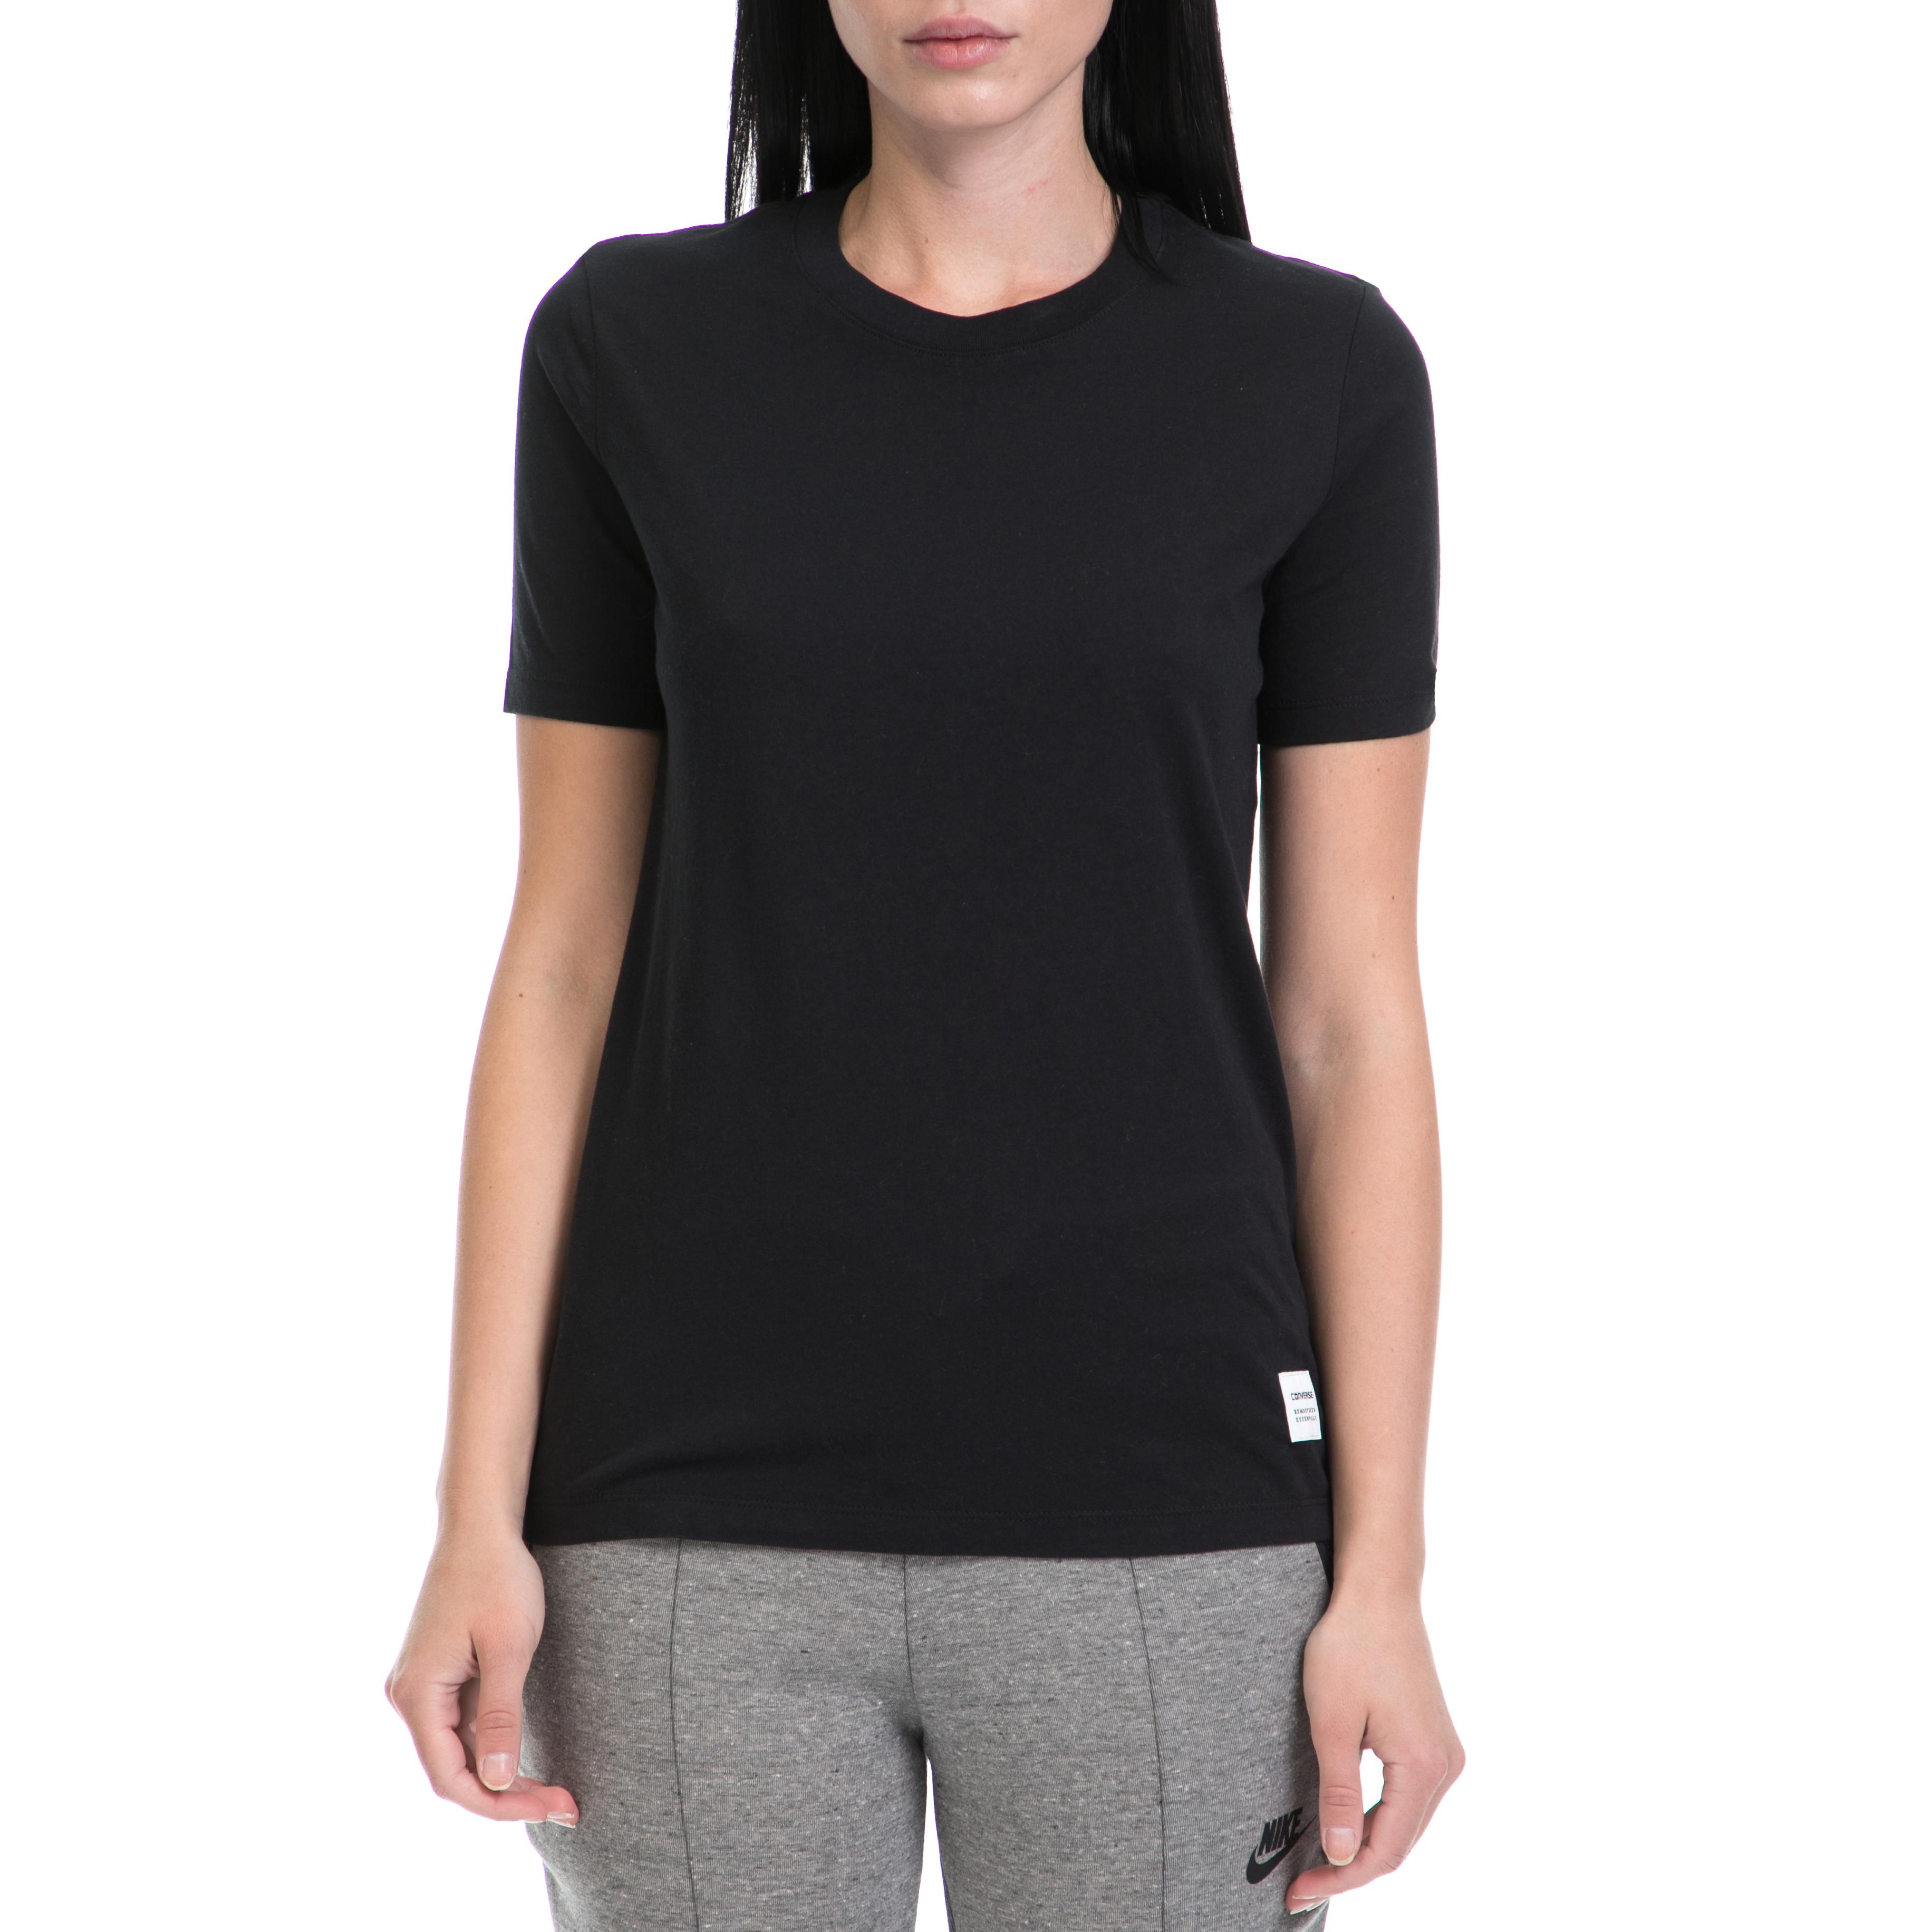 CONVERSE – Γυναικείο T-shirt Converse Essentials Tee μαύρο